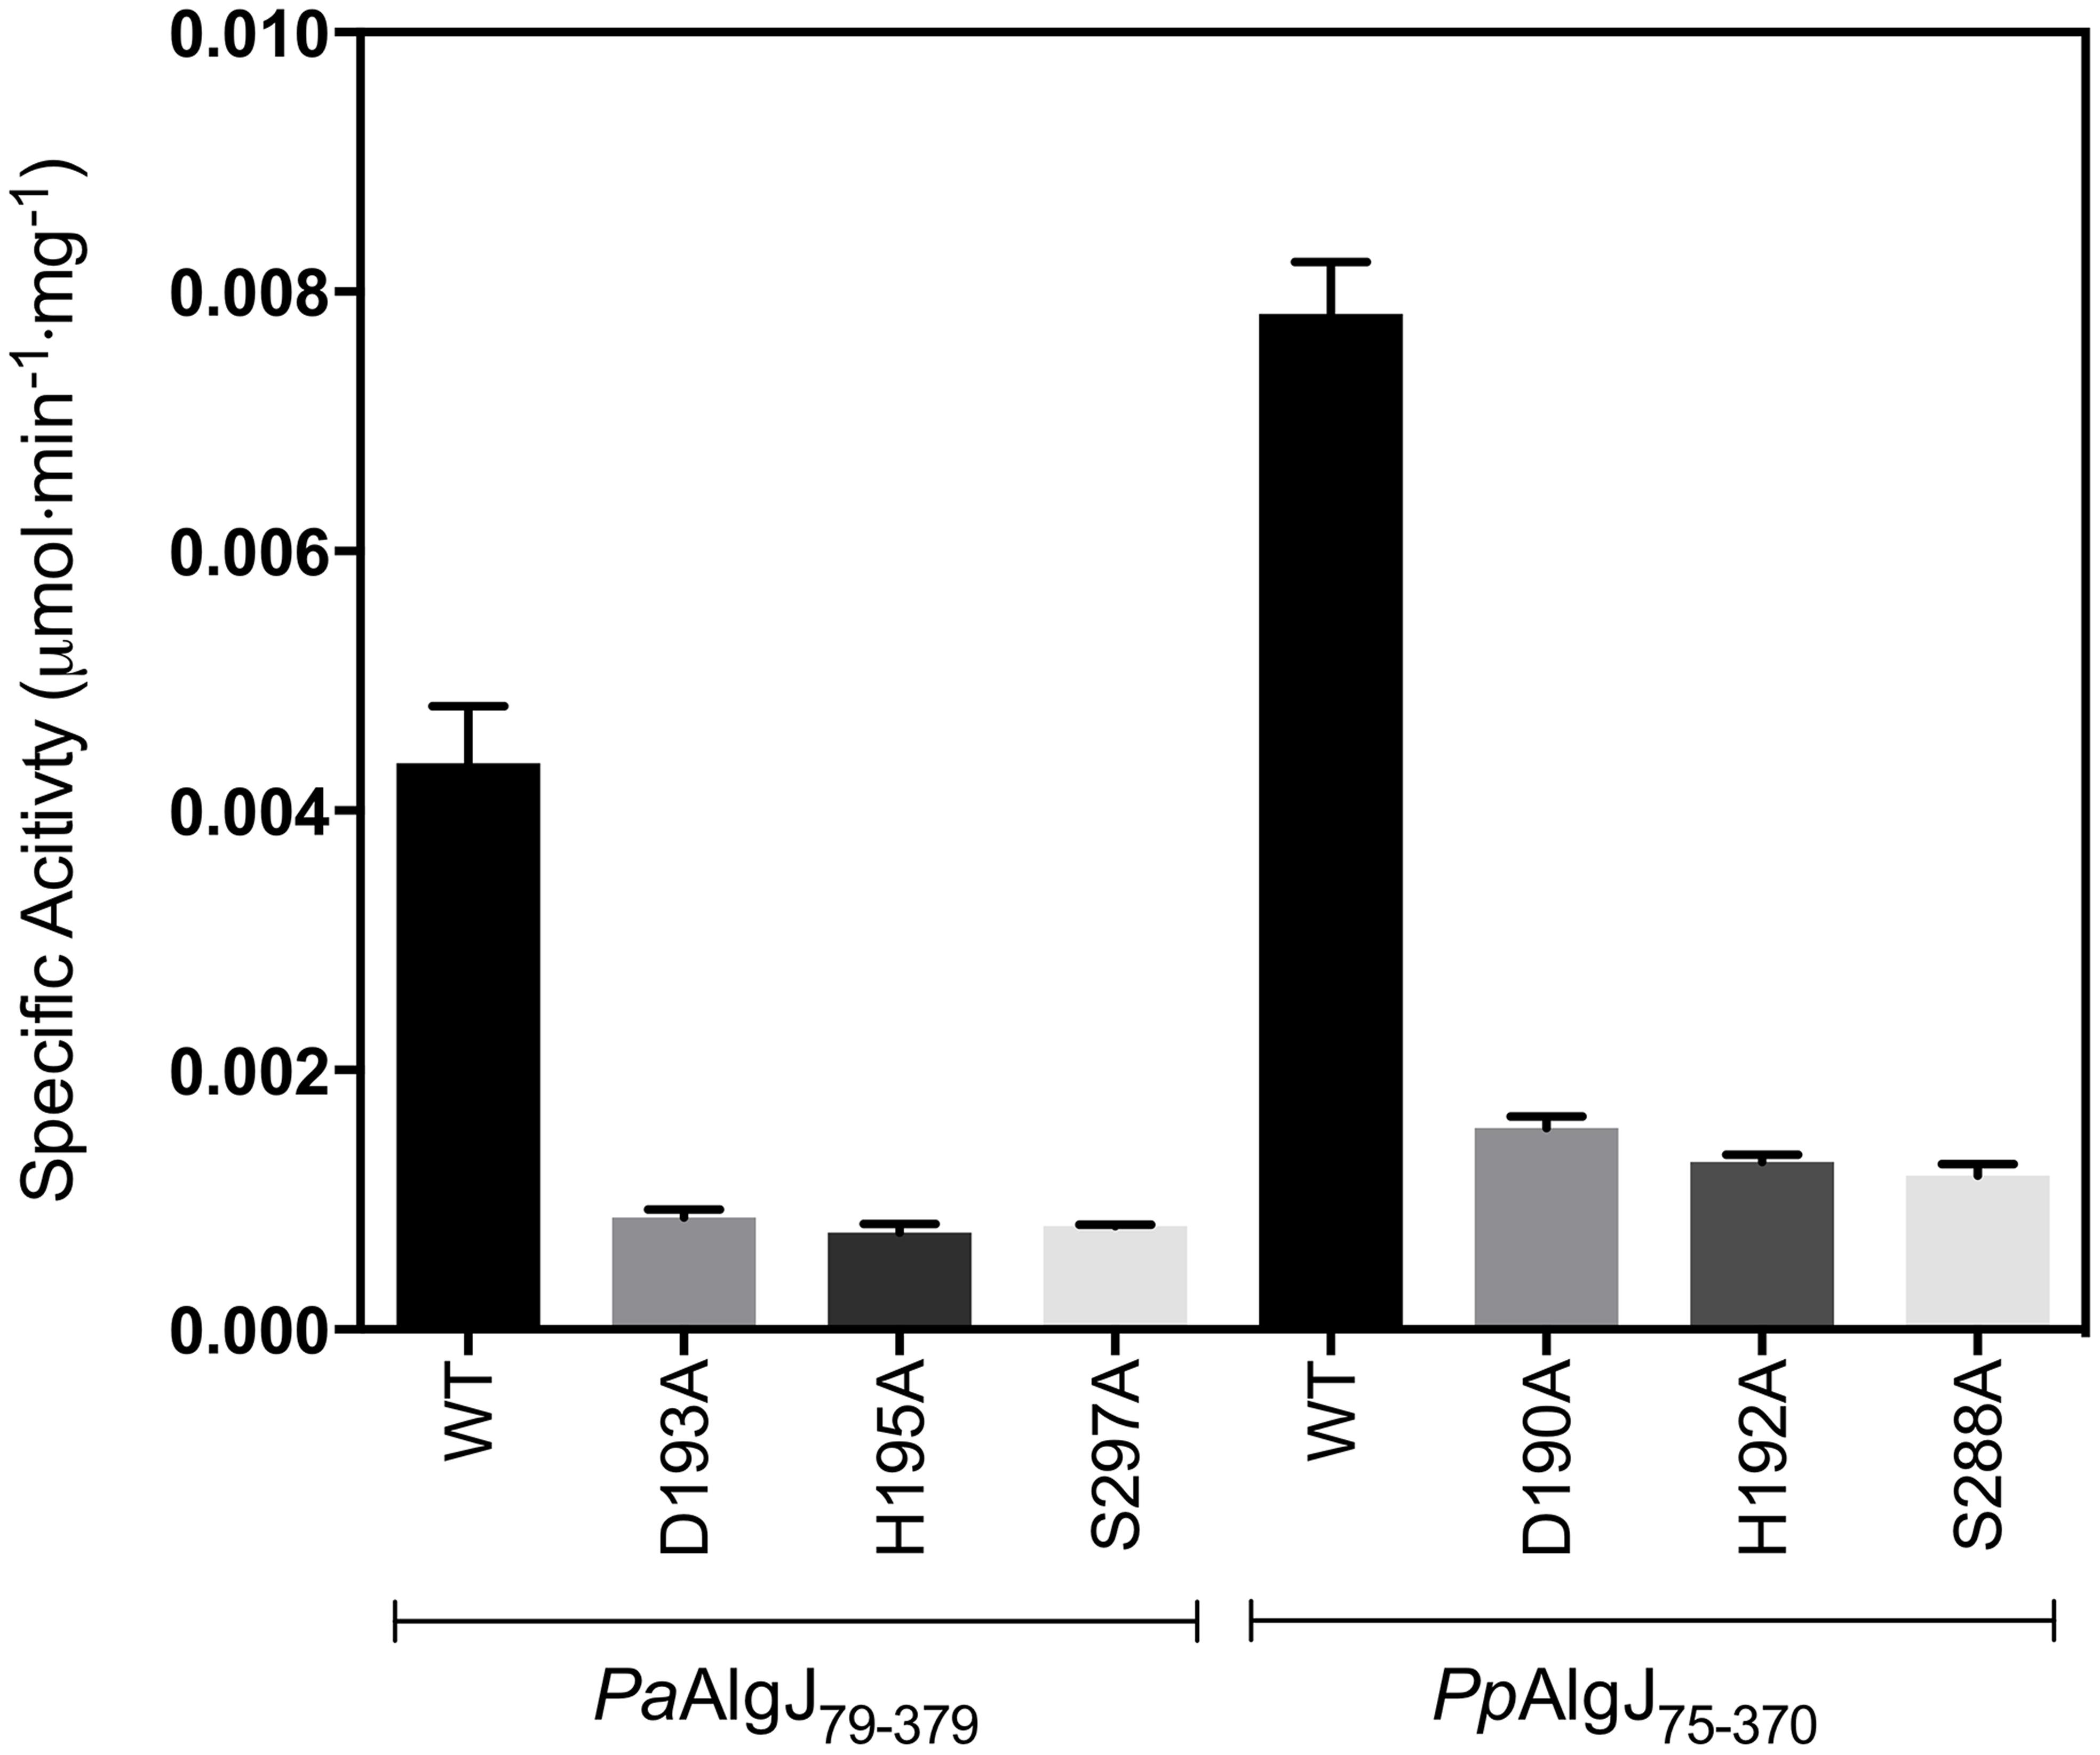 Specific activities of wild-type and catalytic triad mutants of <i>Pp</i>AlgJ<sub>75–370</sub> and <i>Pa</i>AlgJ<sub>79–379</sub>.